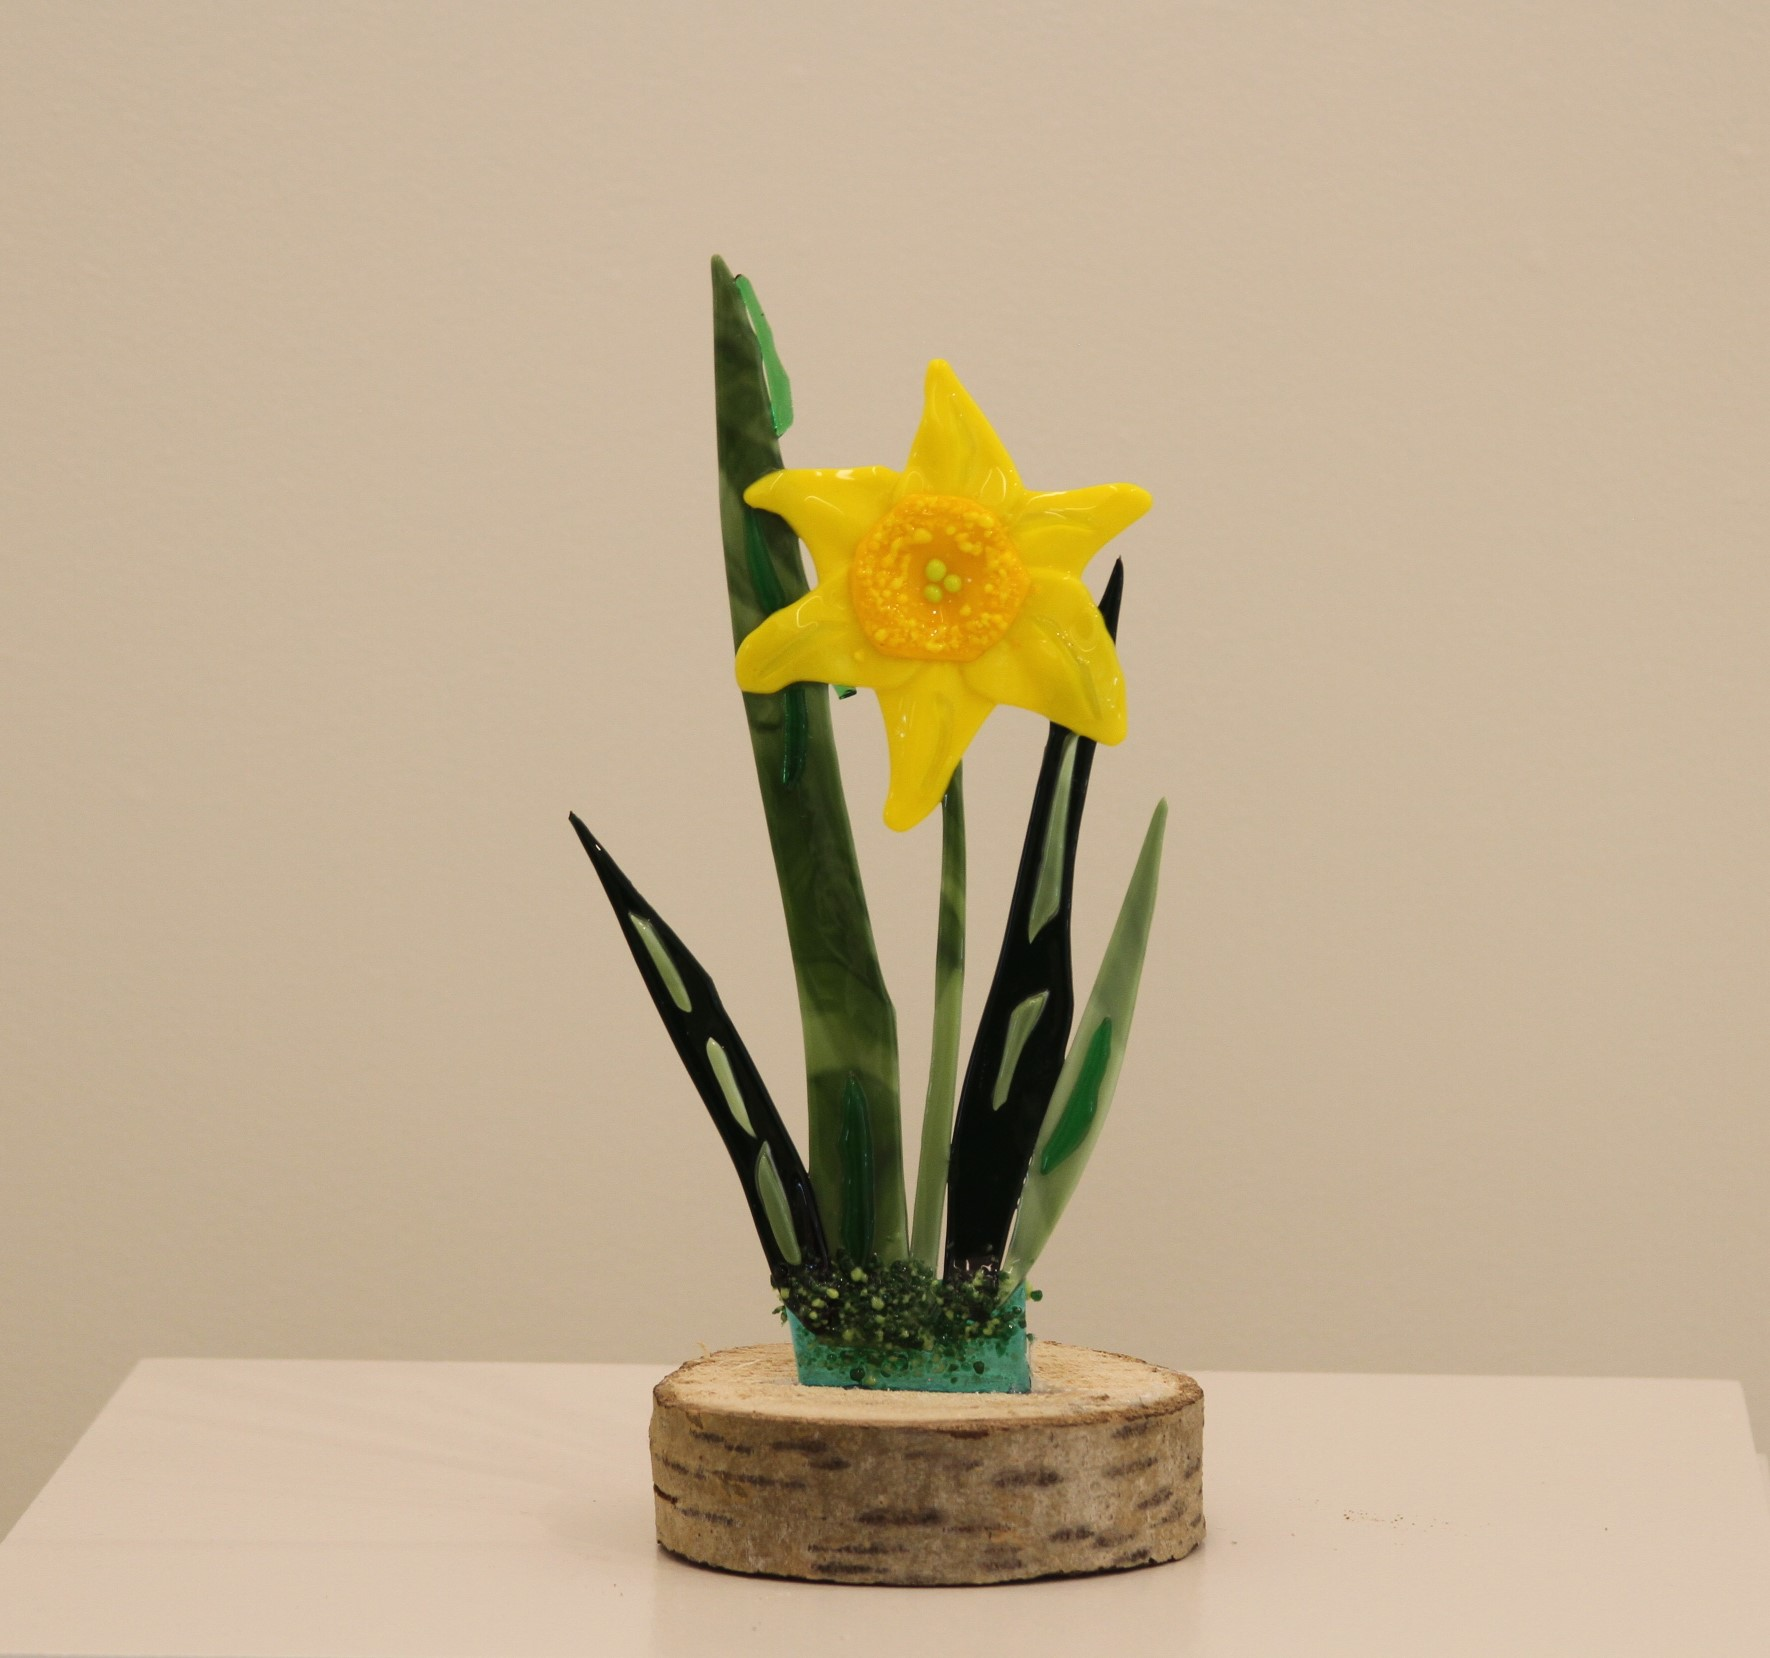 Daffodil on Stump